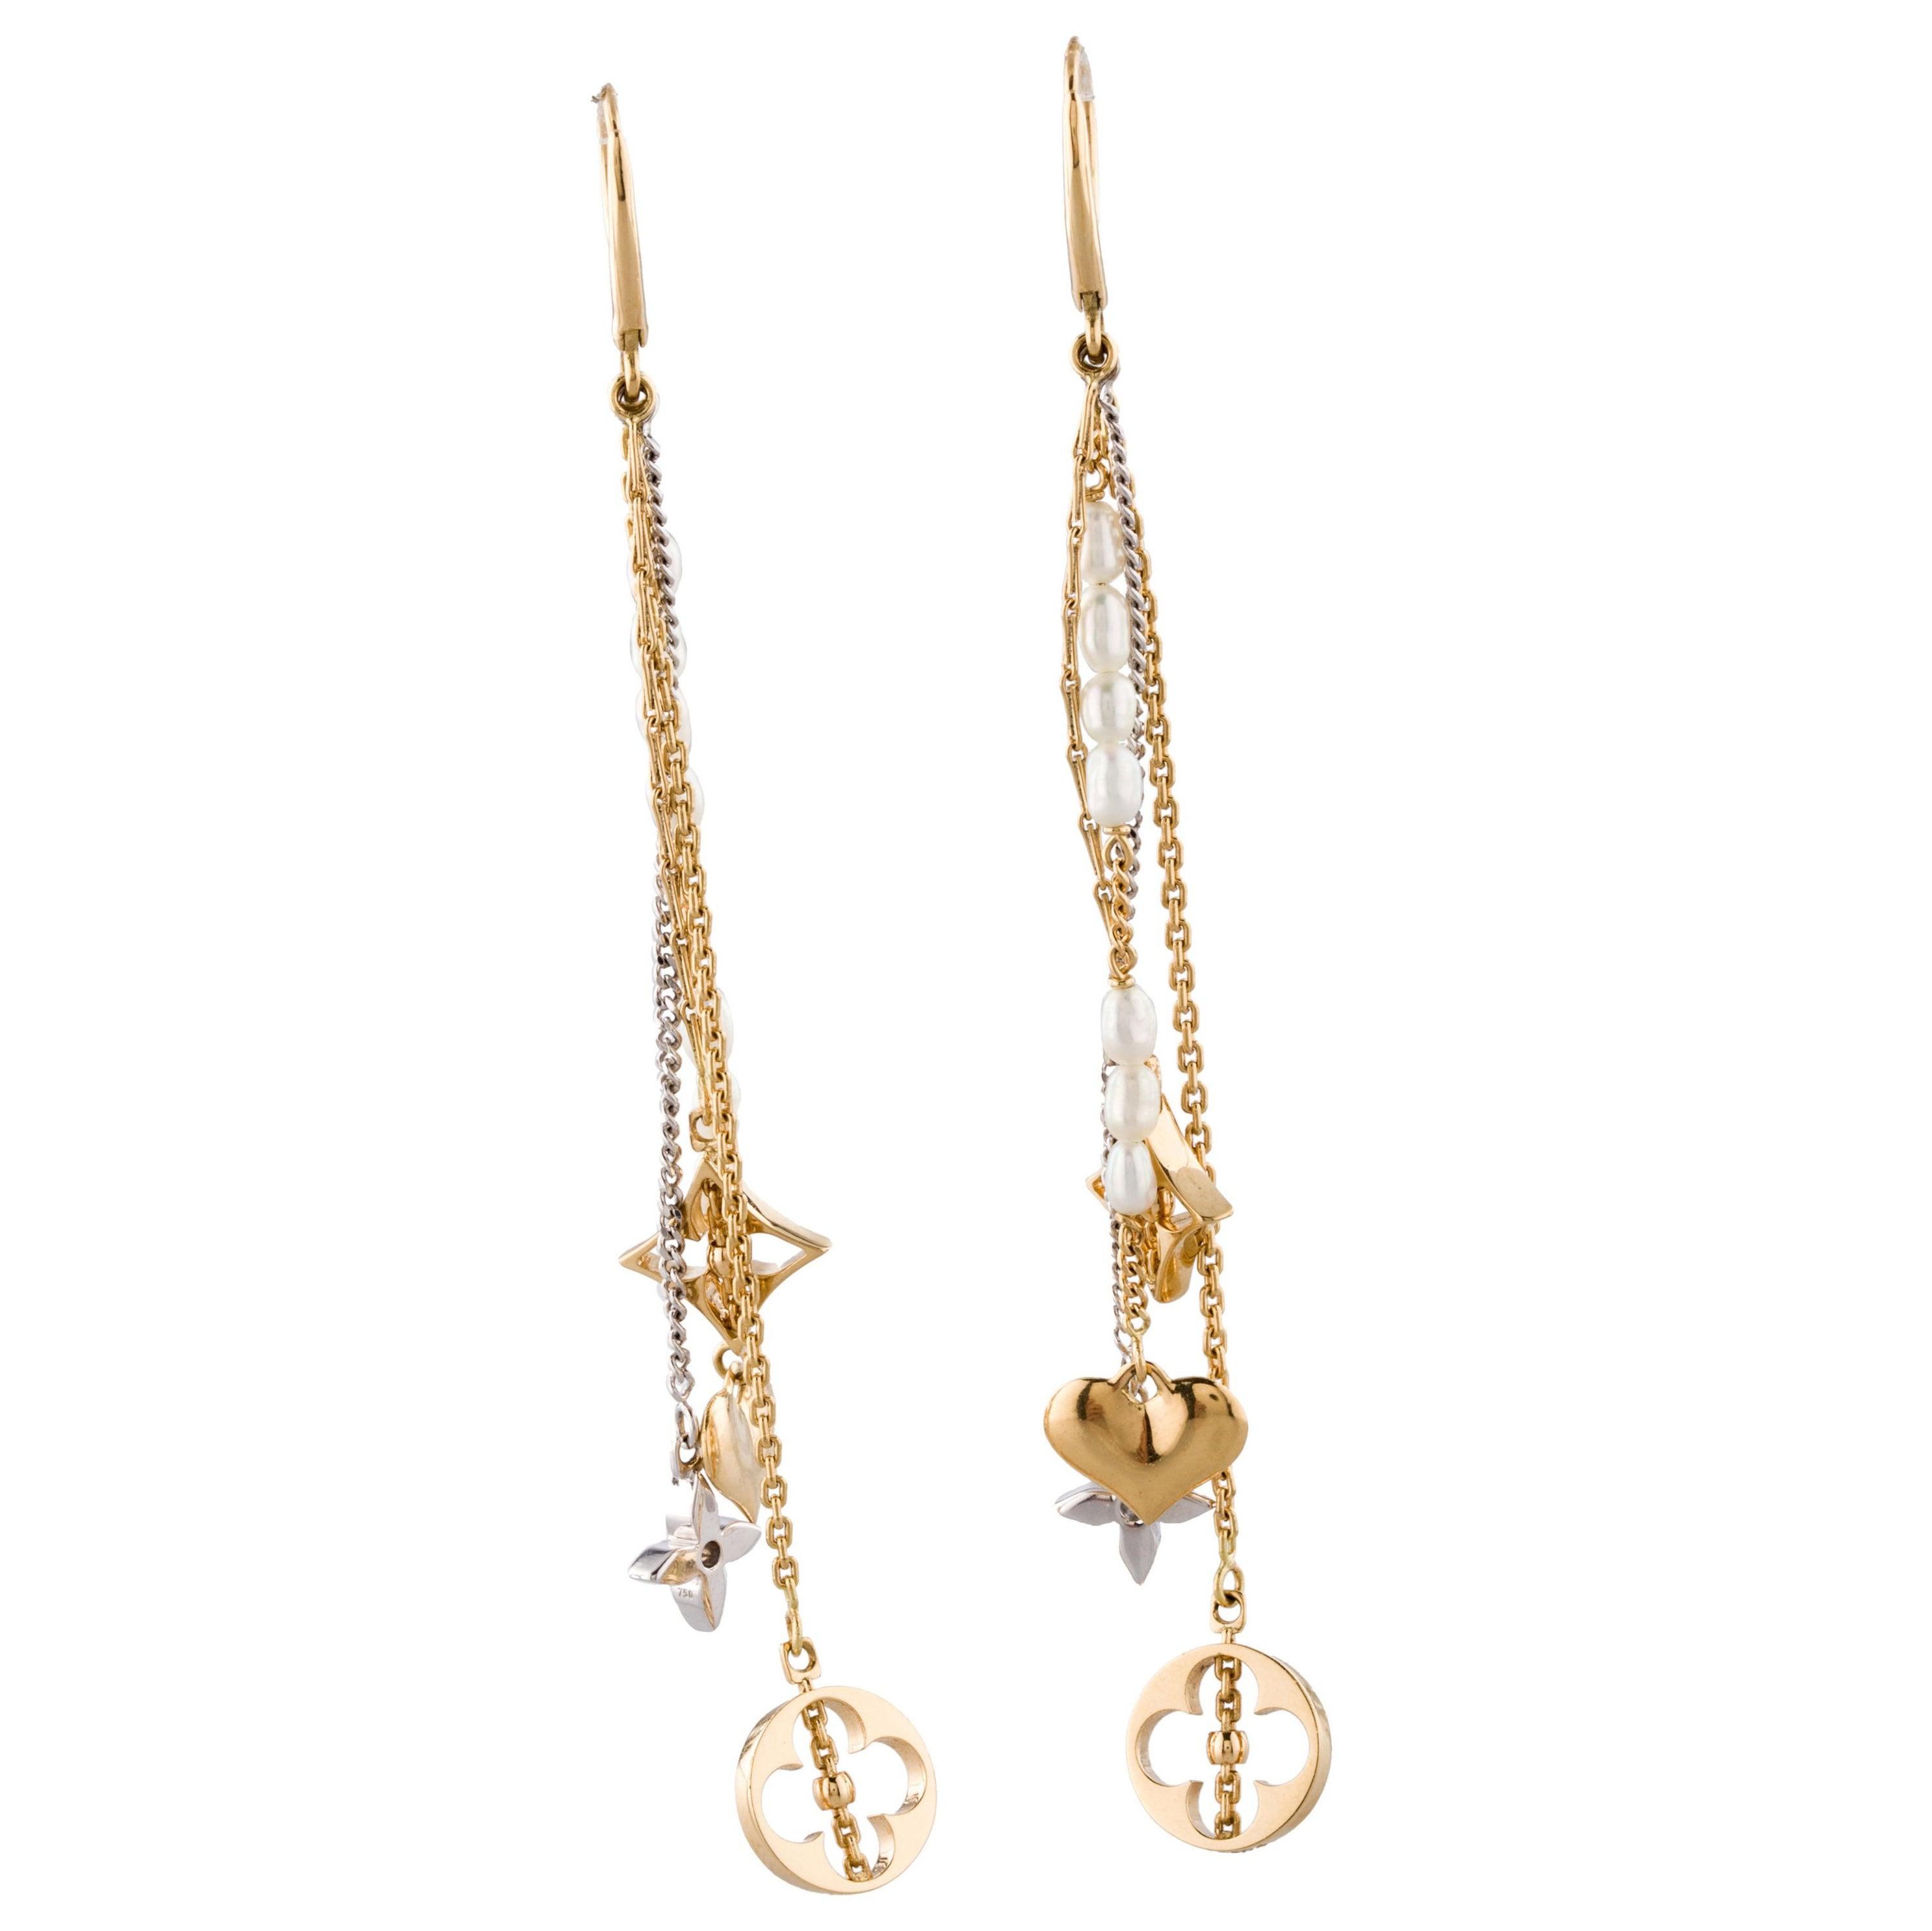 629e0c15e30 Louis Vuitton Monogram Pearl Gold Dangle Earrings at 1stdibs